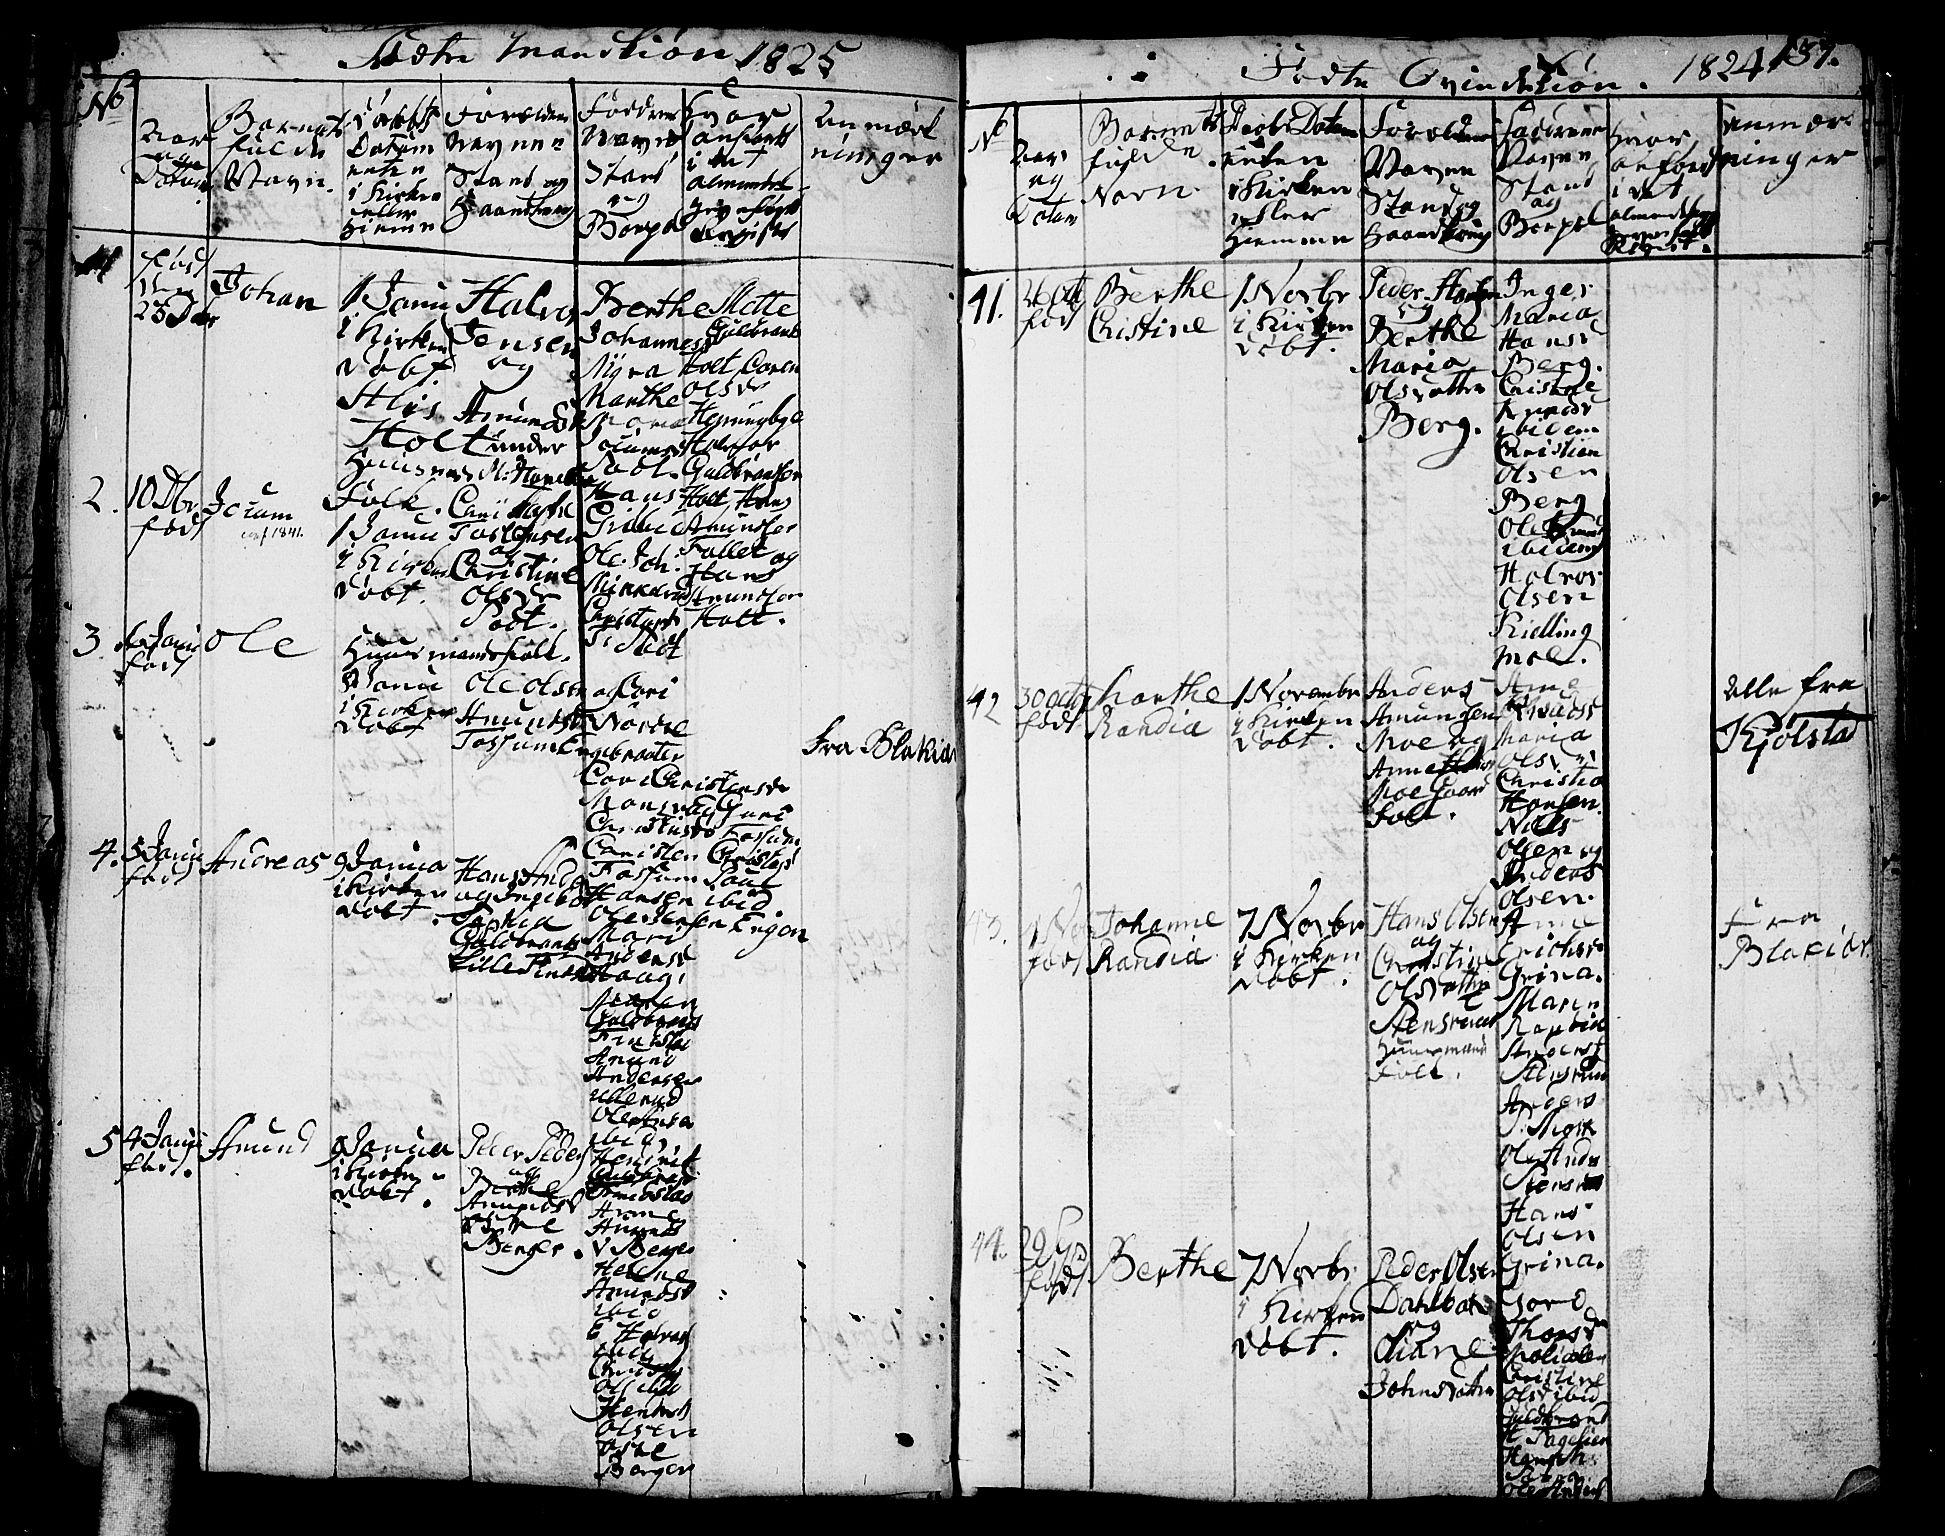 SAO, Aurskog prestekontor Kirkebøker, F/Fa/L0005: Ministerialbok nr. I 5, 1814-1829, s. 137